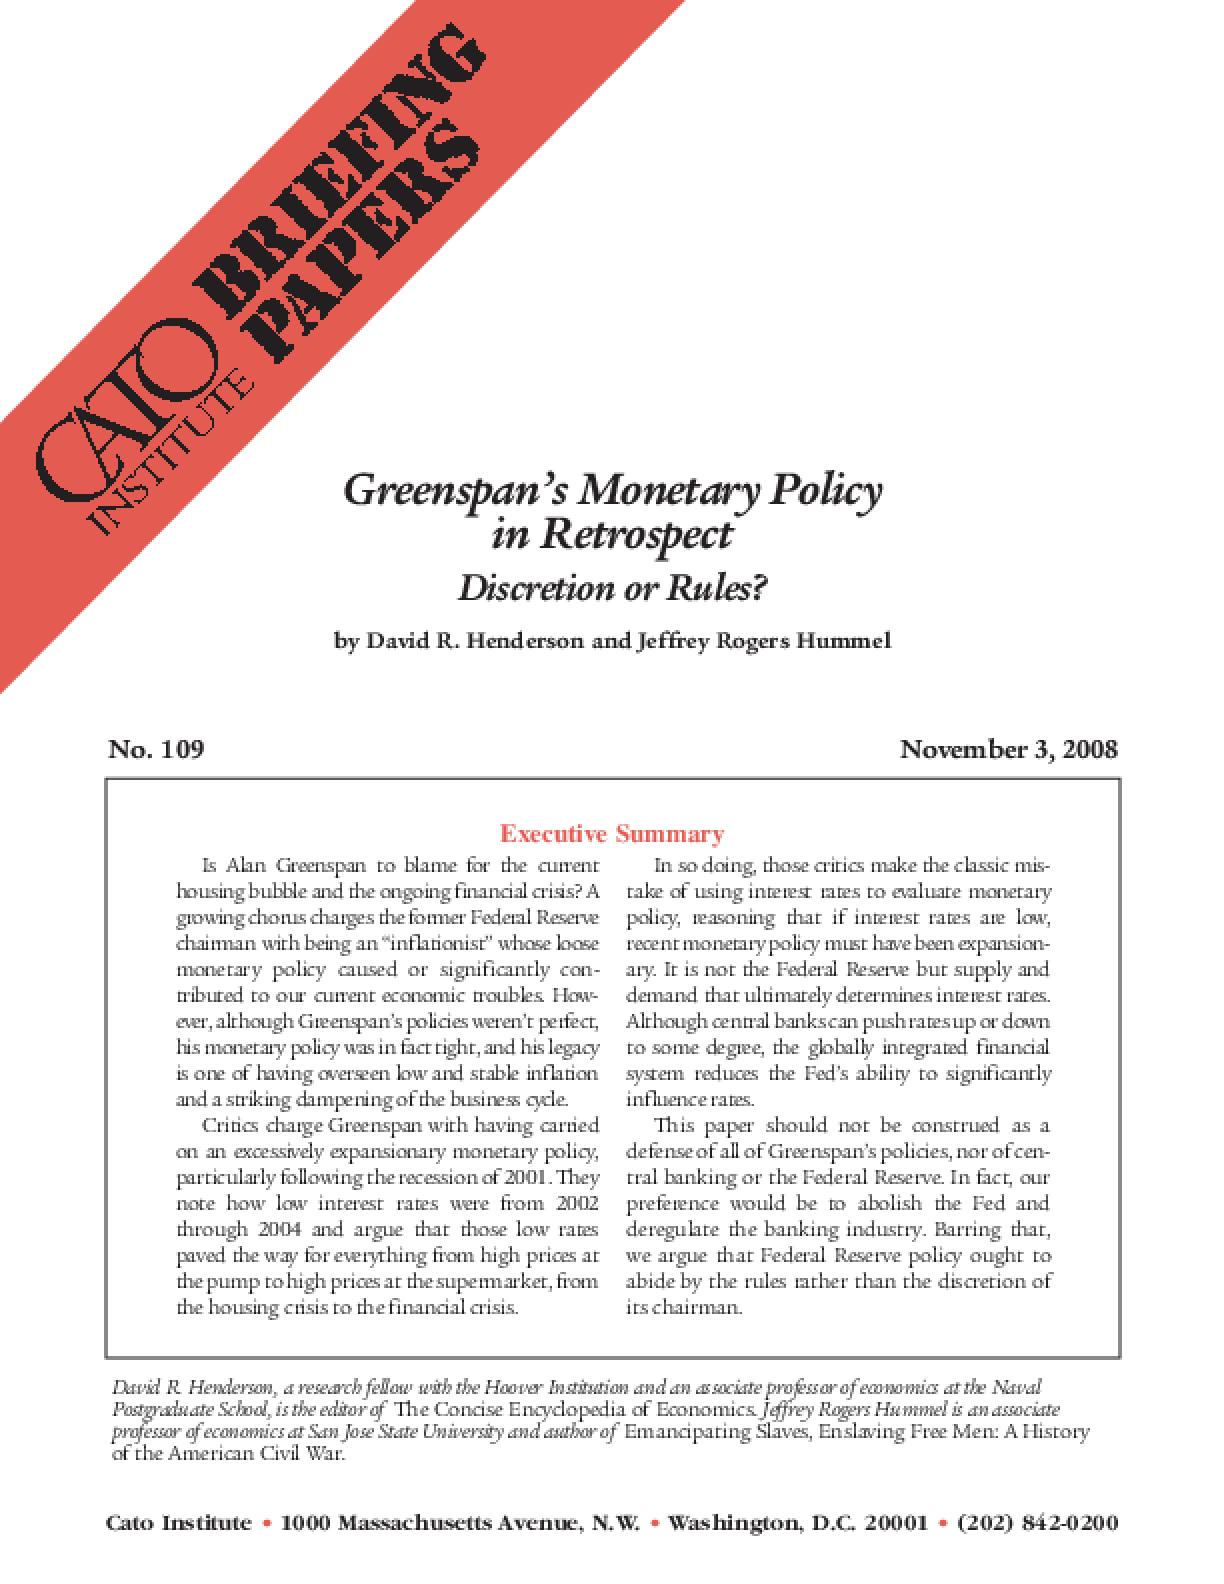 Greenspan's Monetary Policy in Retrospect